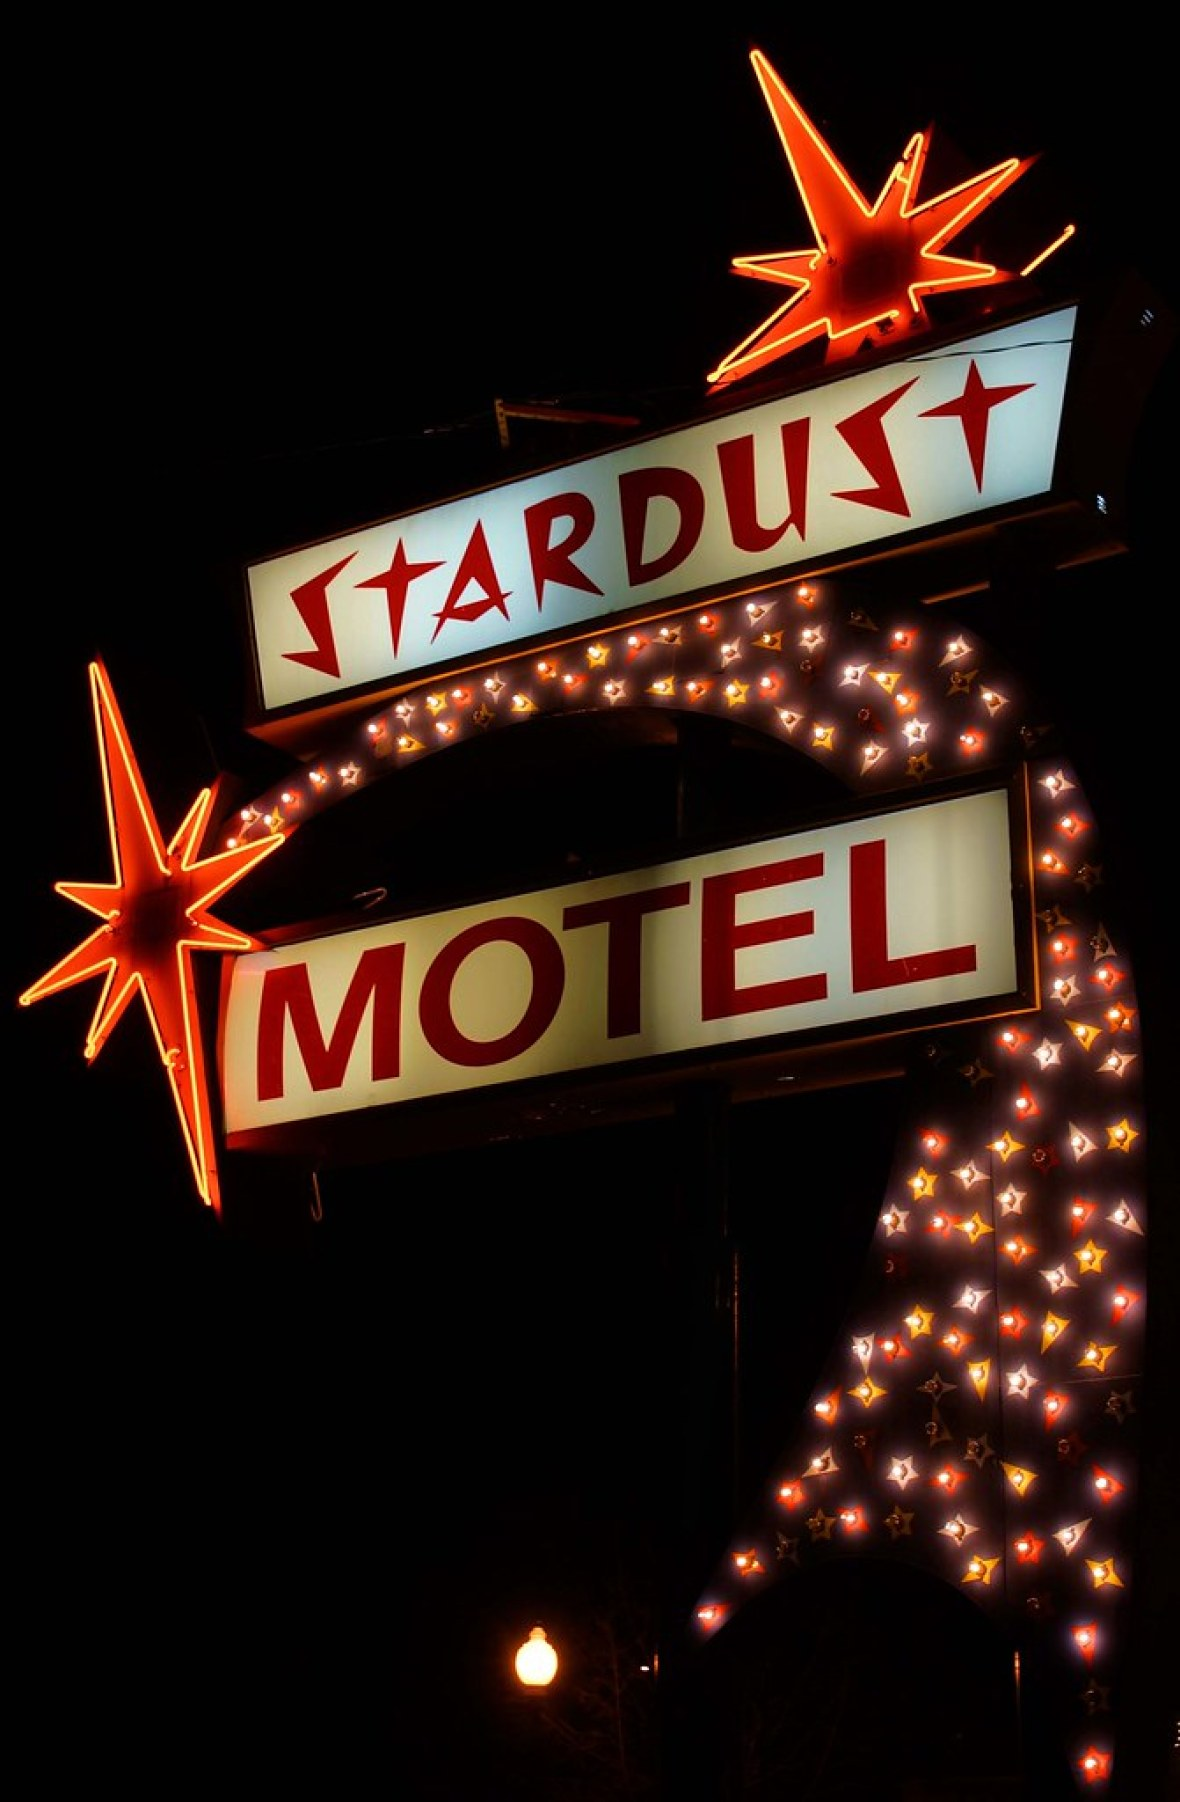 Stardust Motel - Wallace, Idaho U.S.A. - December 7, 2013